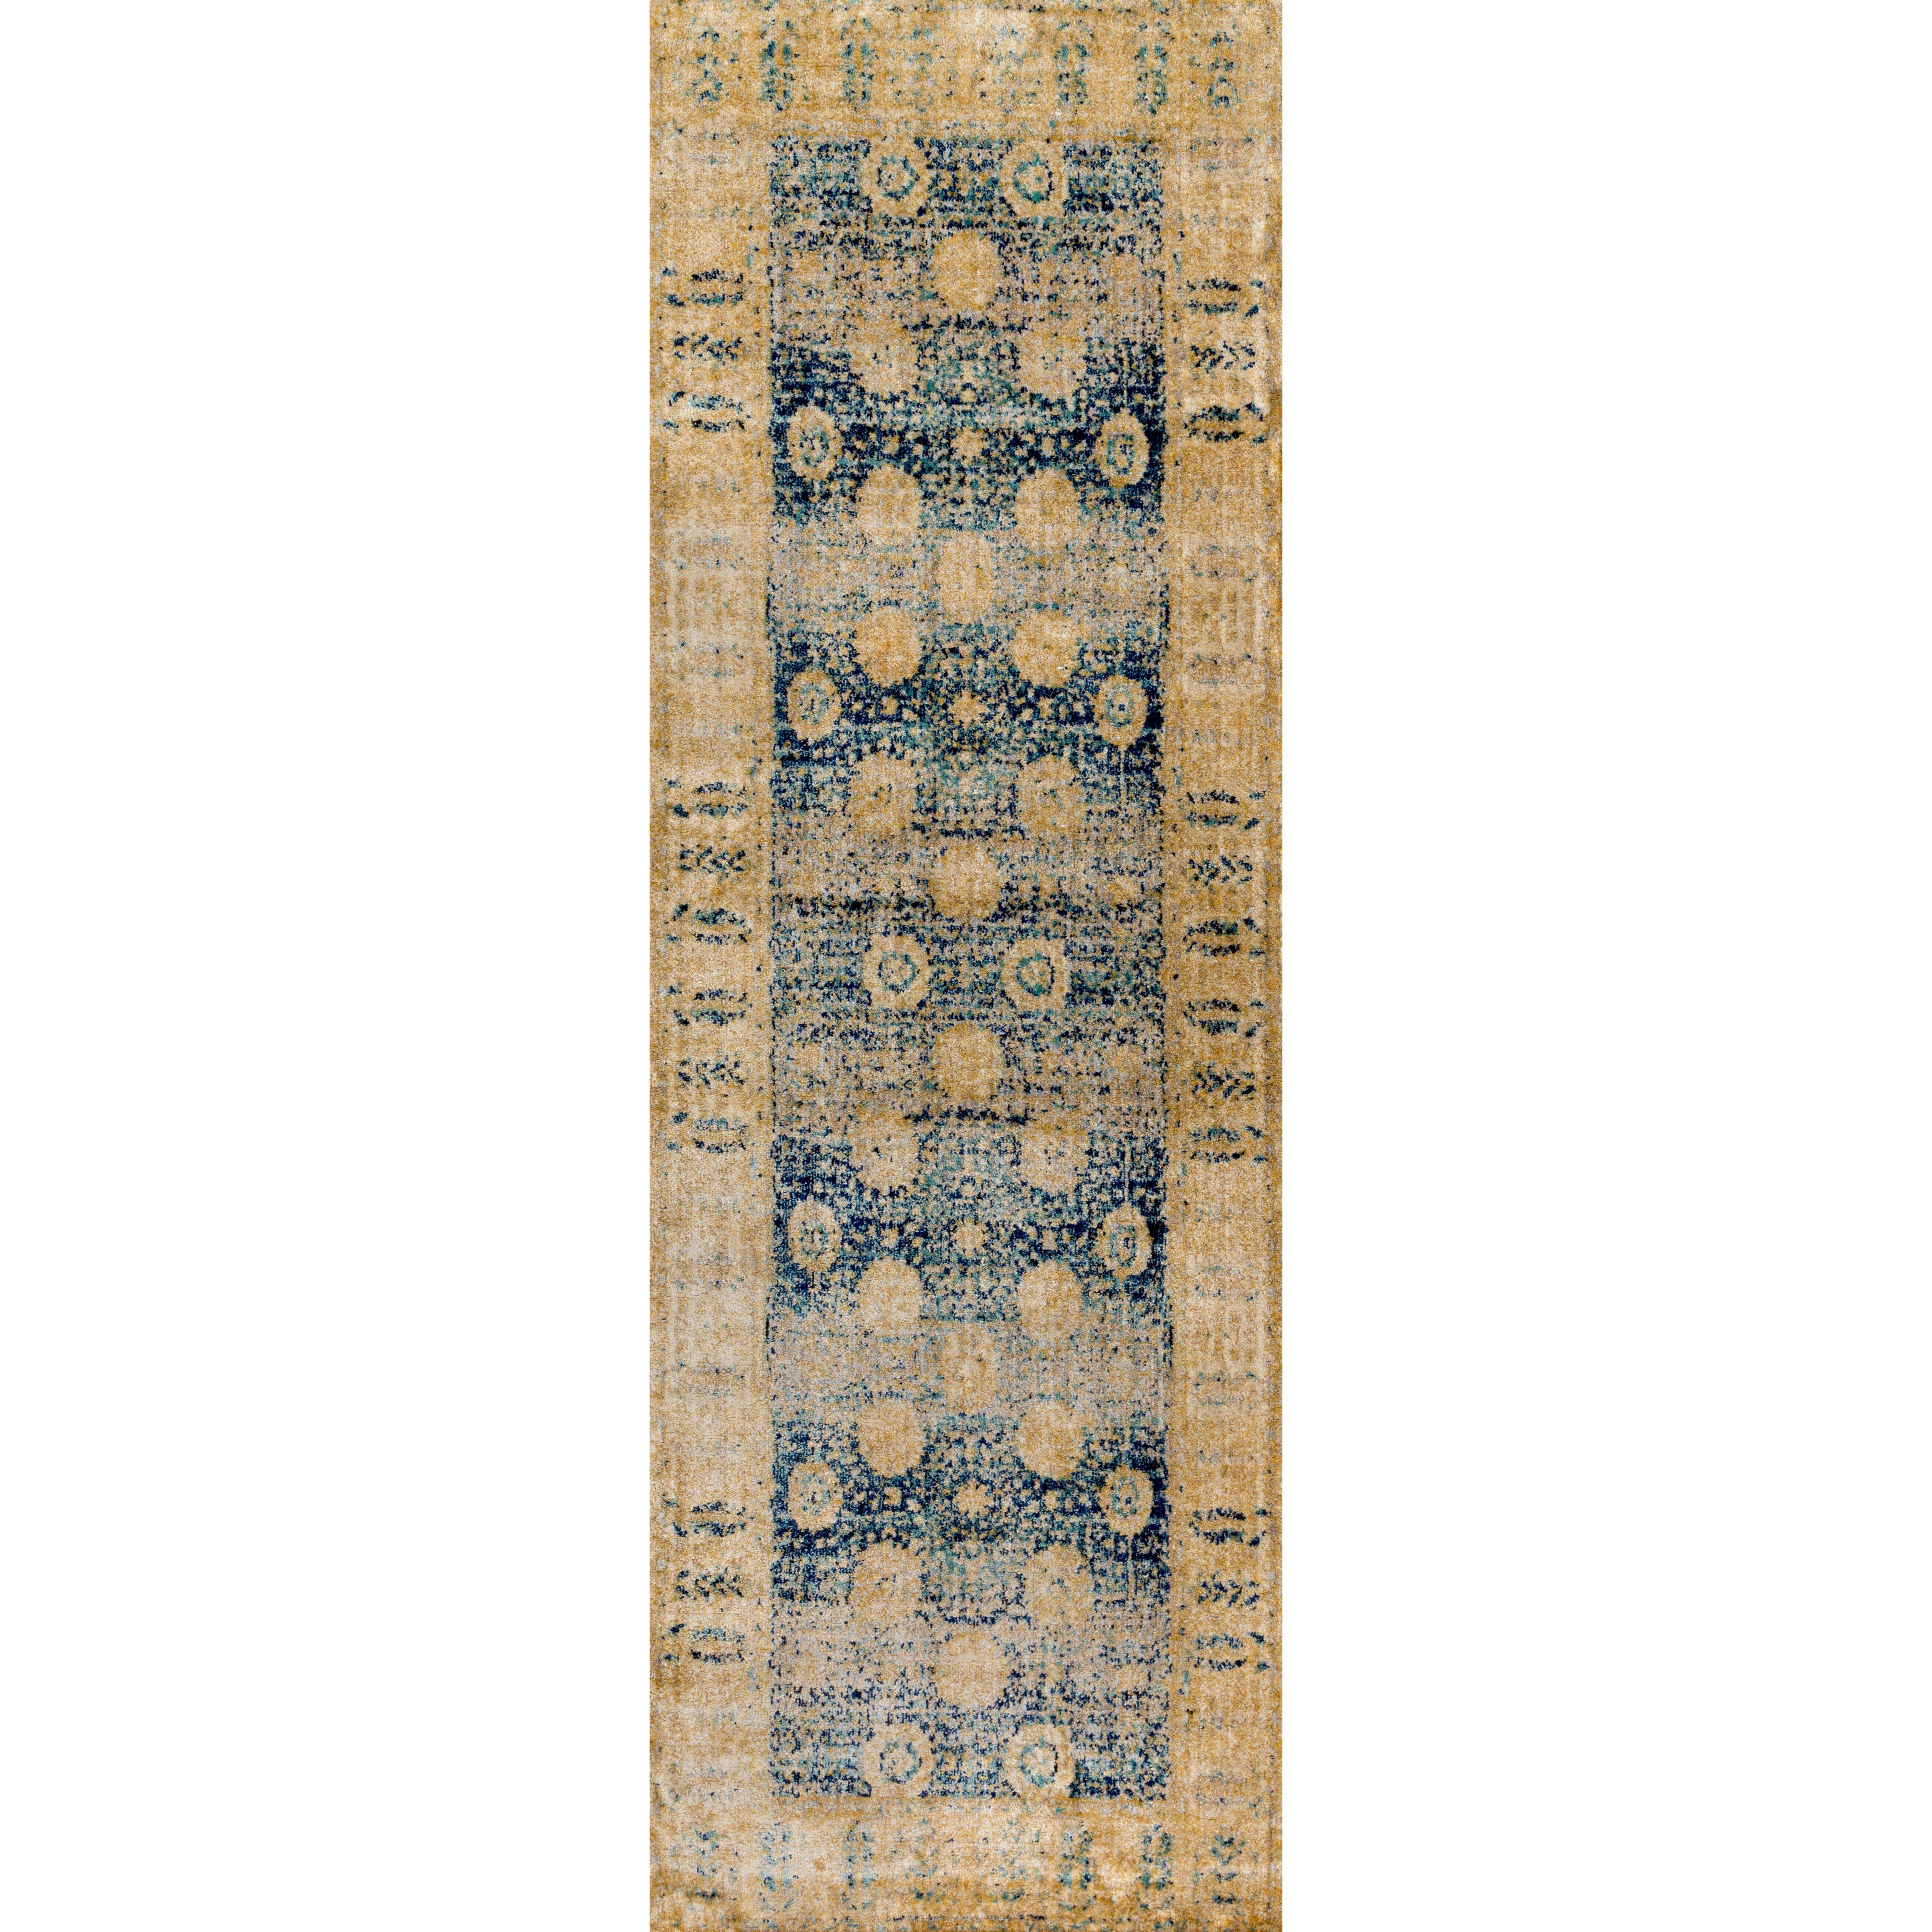 loloi rugs anastasia blue gold area rug reviews wayfair. Black Bedroom Furniture Sets. Home Design Ideas